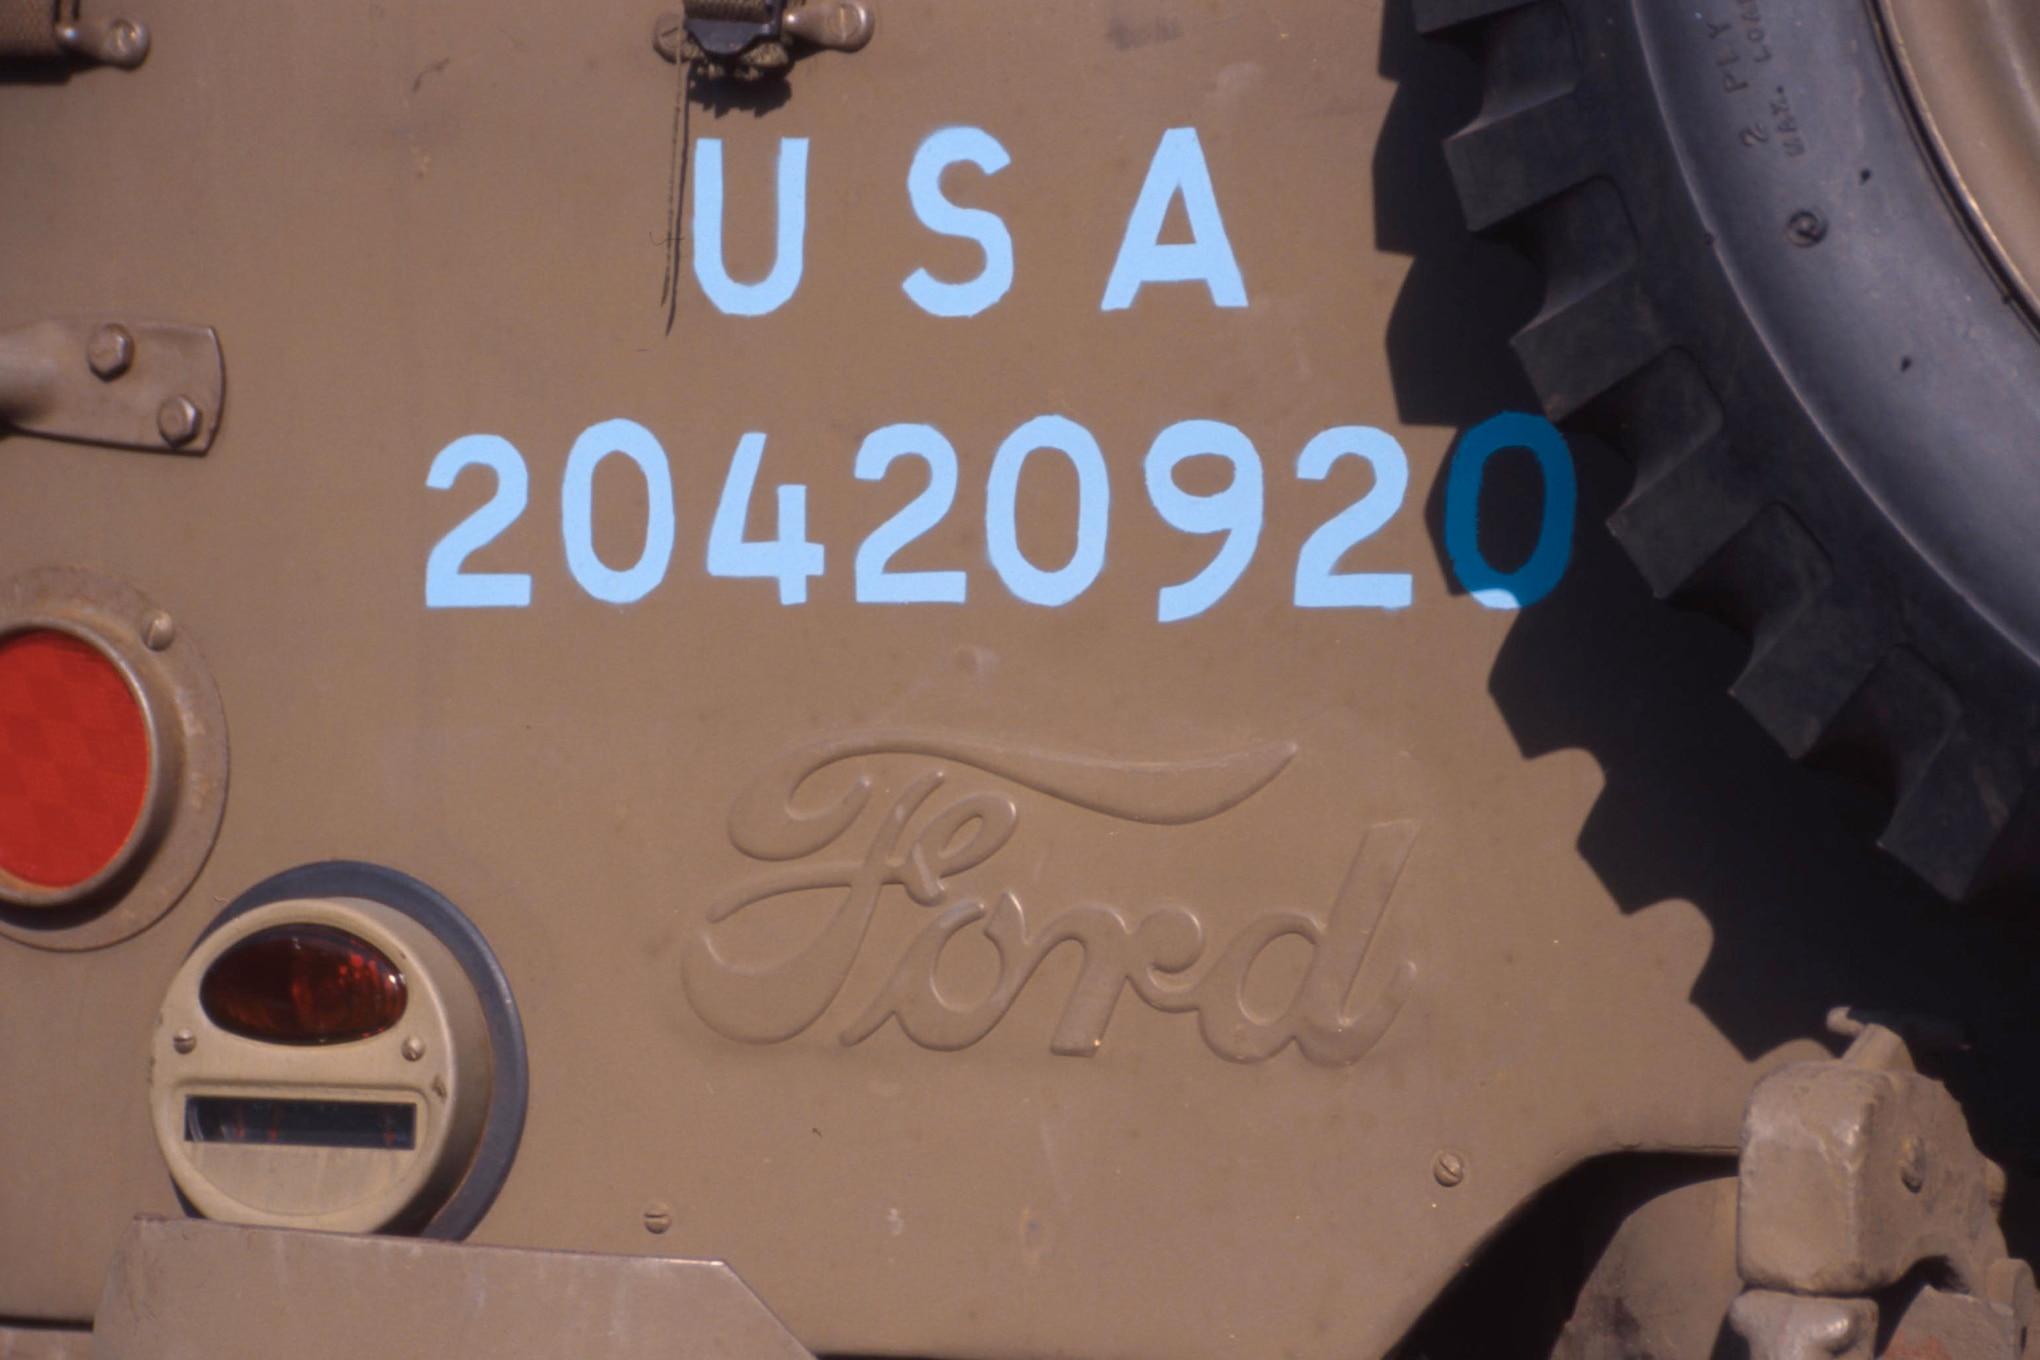 005 42 GPW script detail